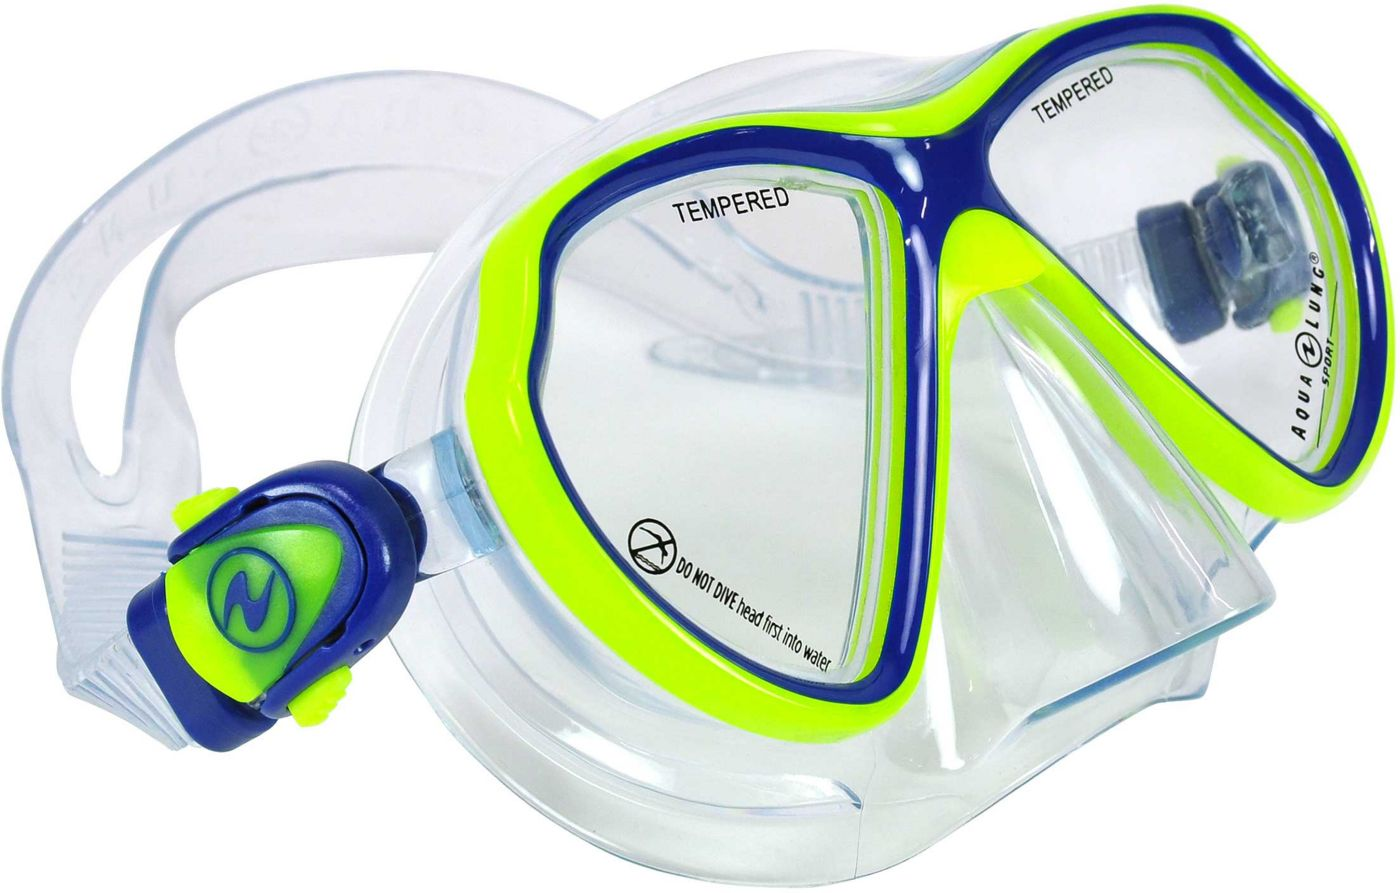 Aqua Lung Sport Jr. Lanai Snorkeling Mask